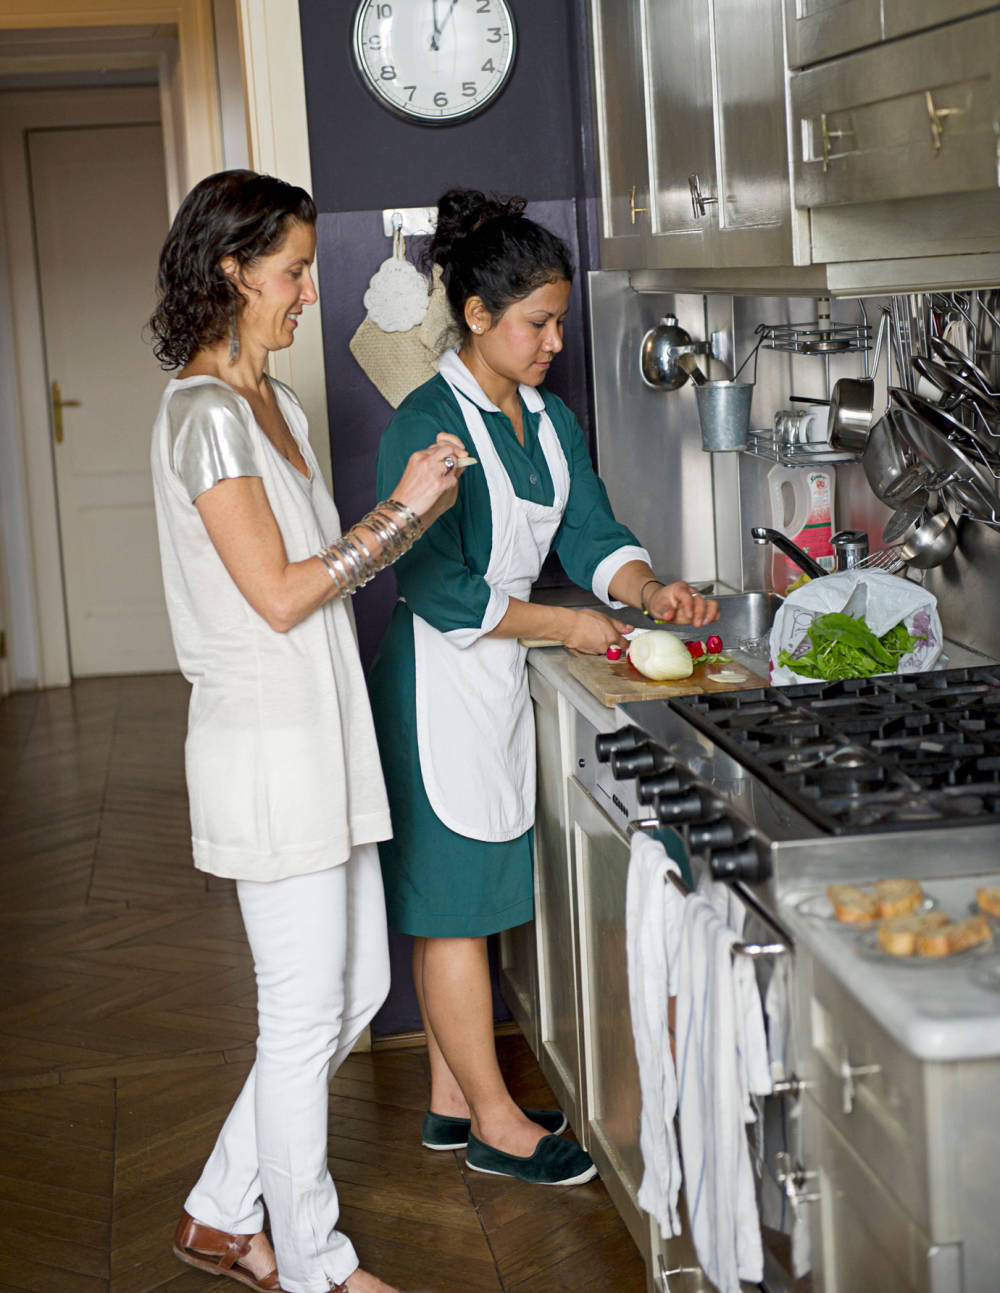 TCX-08-1-osanna-visconti-kitchen-italian-palazzo-1111-xl-mv